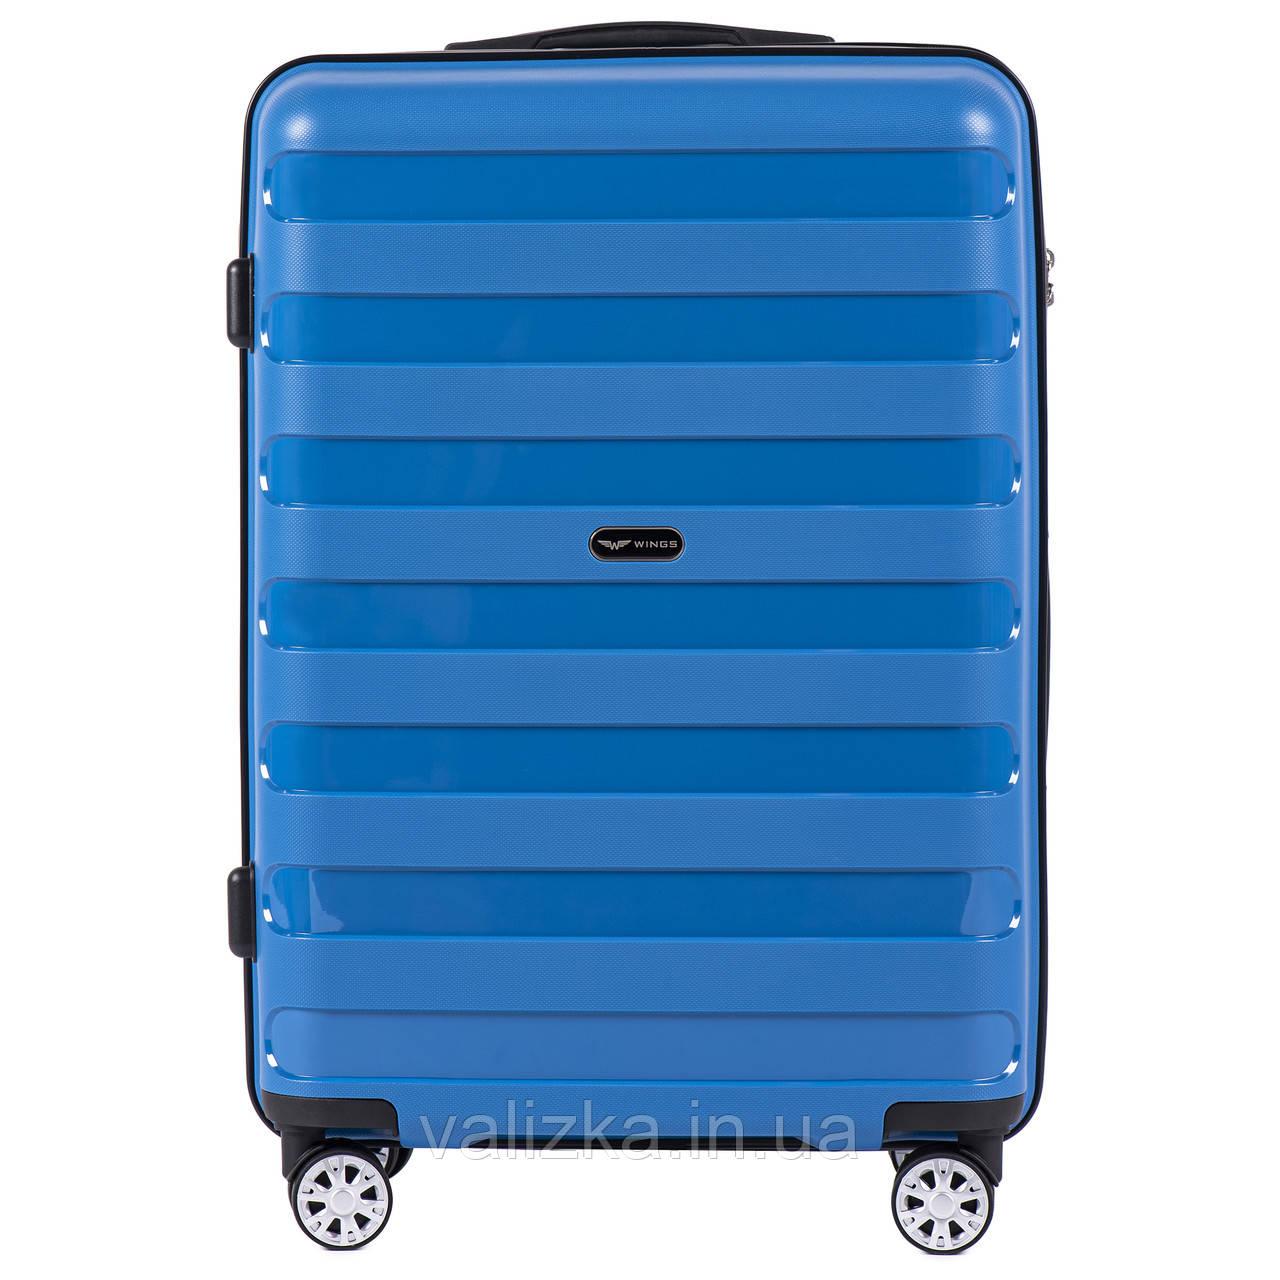 Средний чемодан из полипропилена премиум серии синий Wings PP07